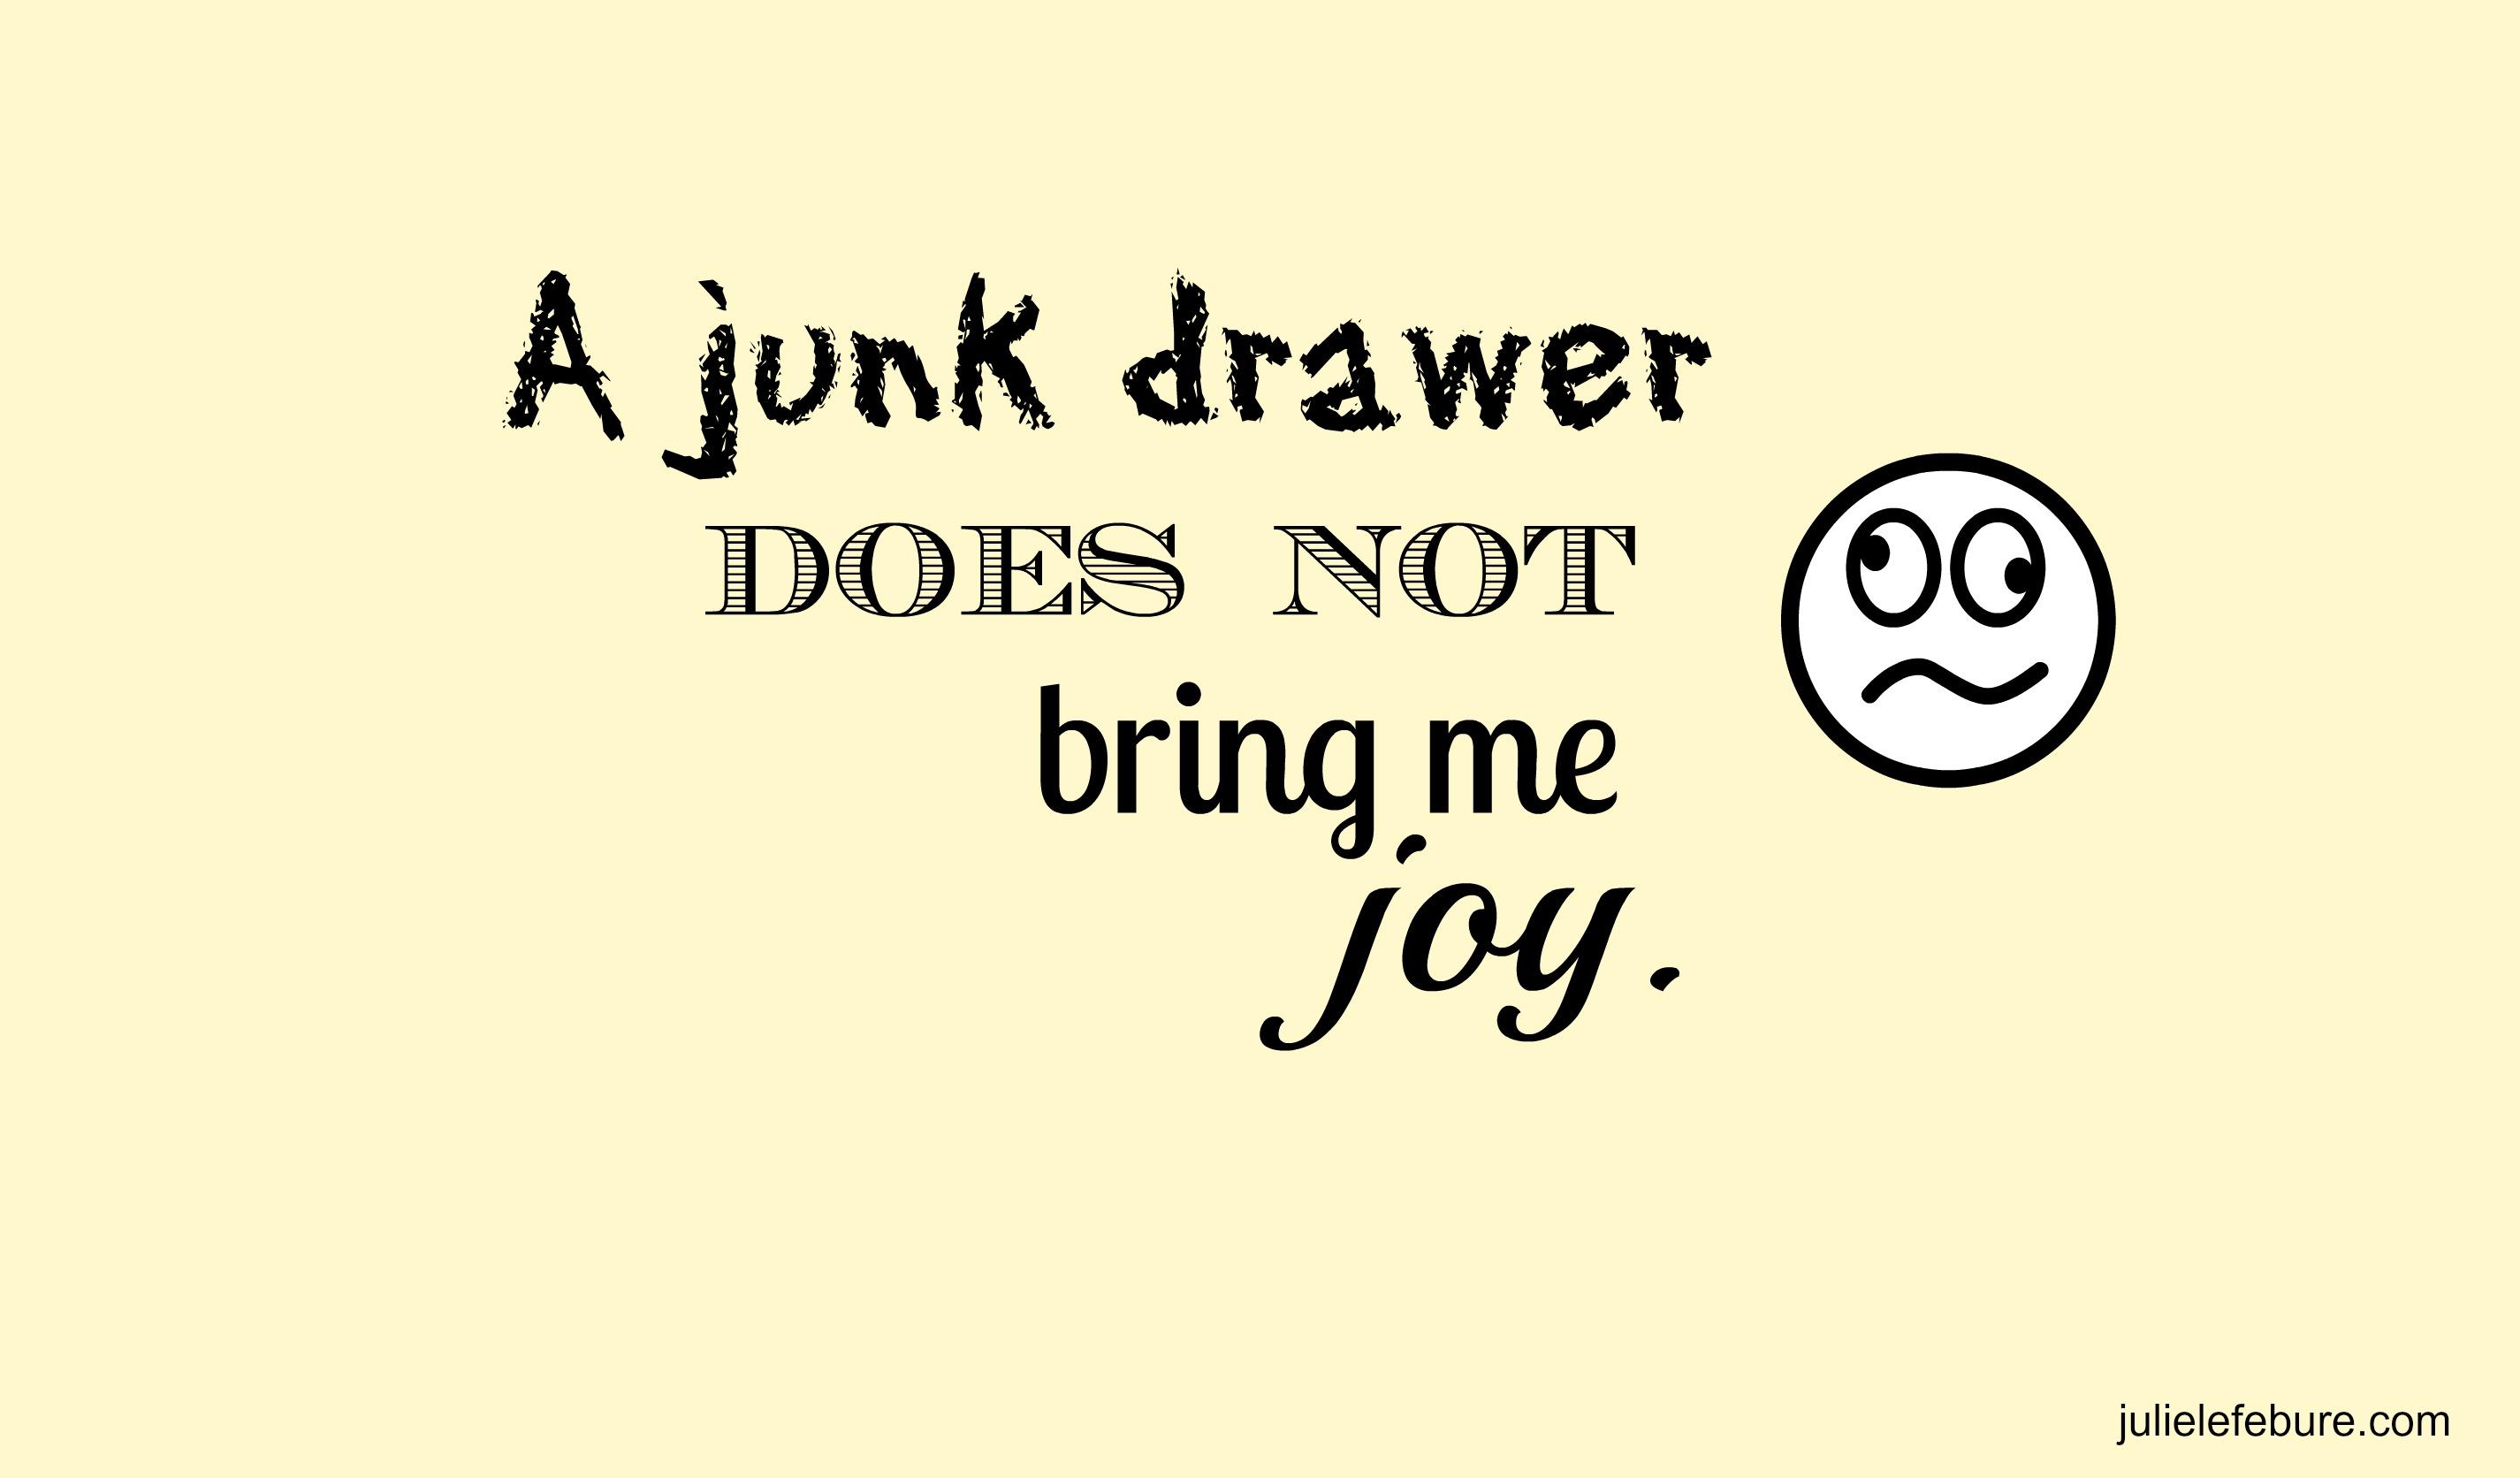 Goodbye Junk Drawer